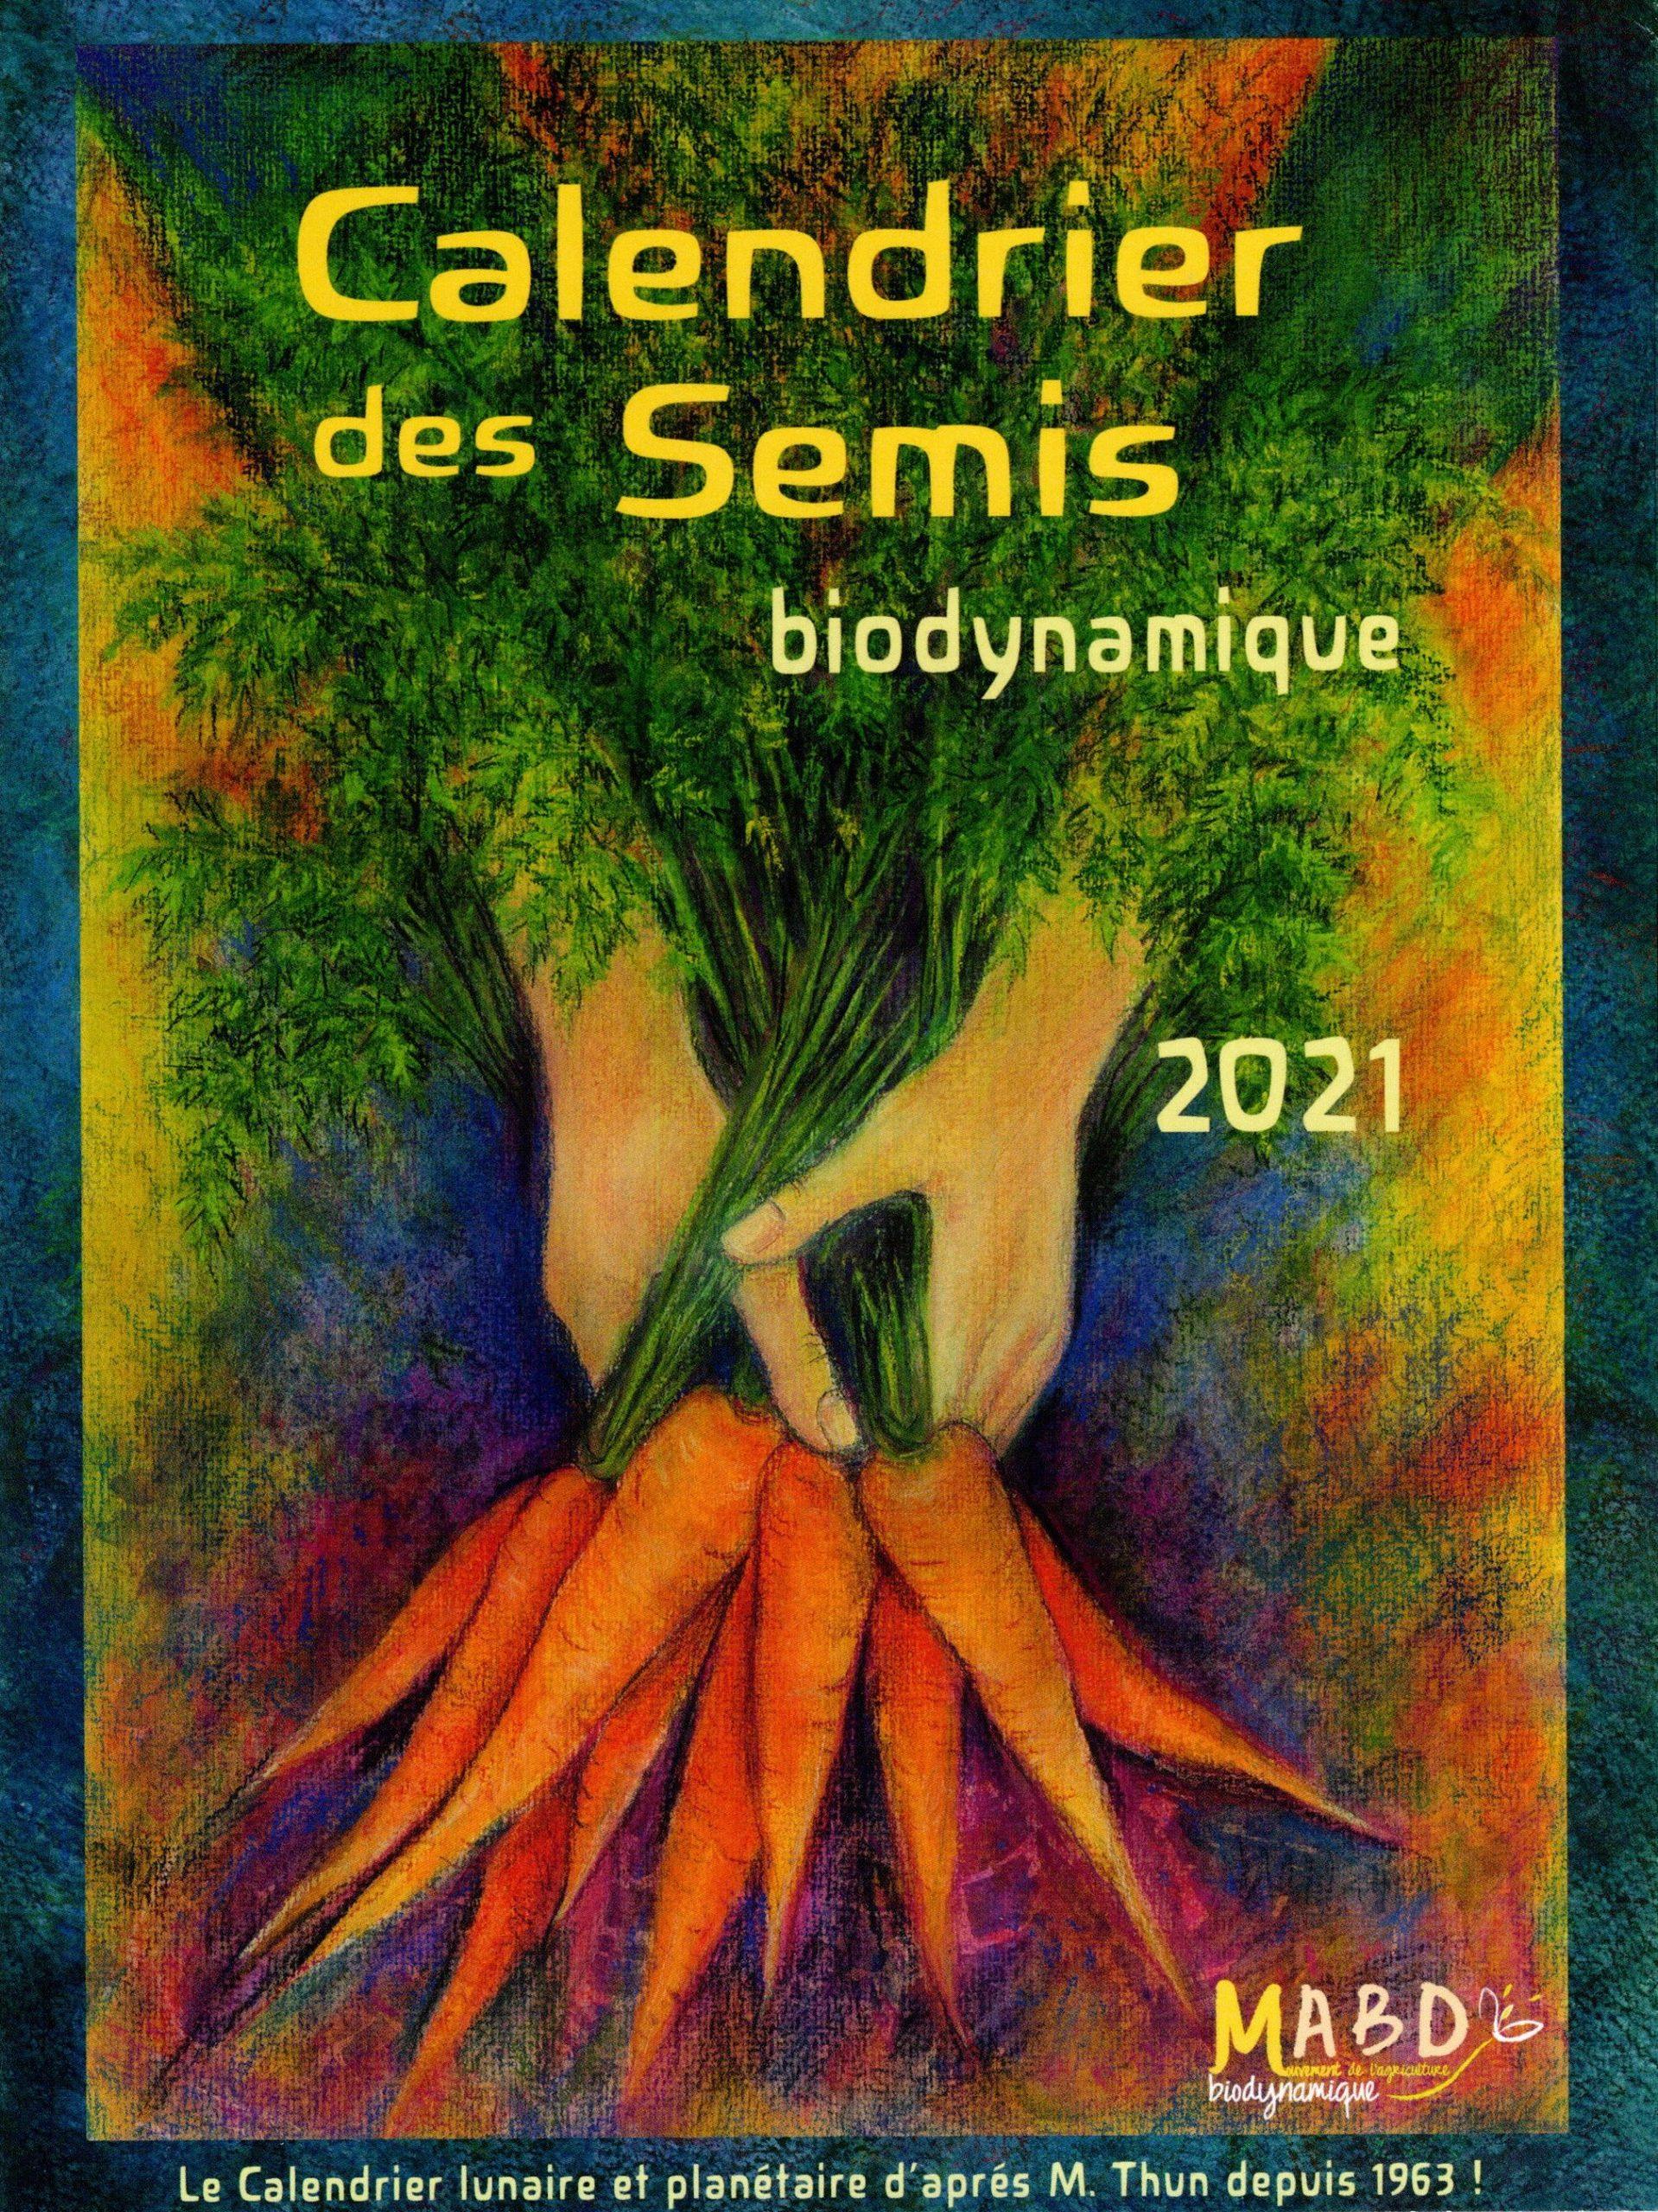 Calendrier Biodynamique 2021 Calendrier des semis biodynamique 2021 – Promonature